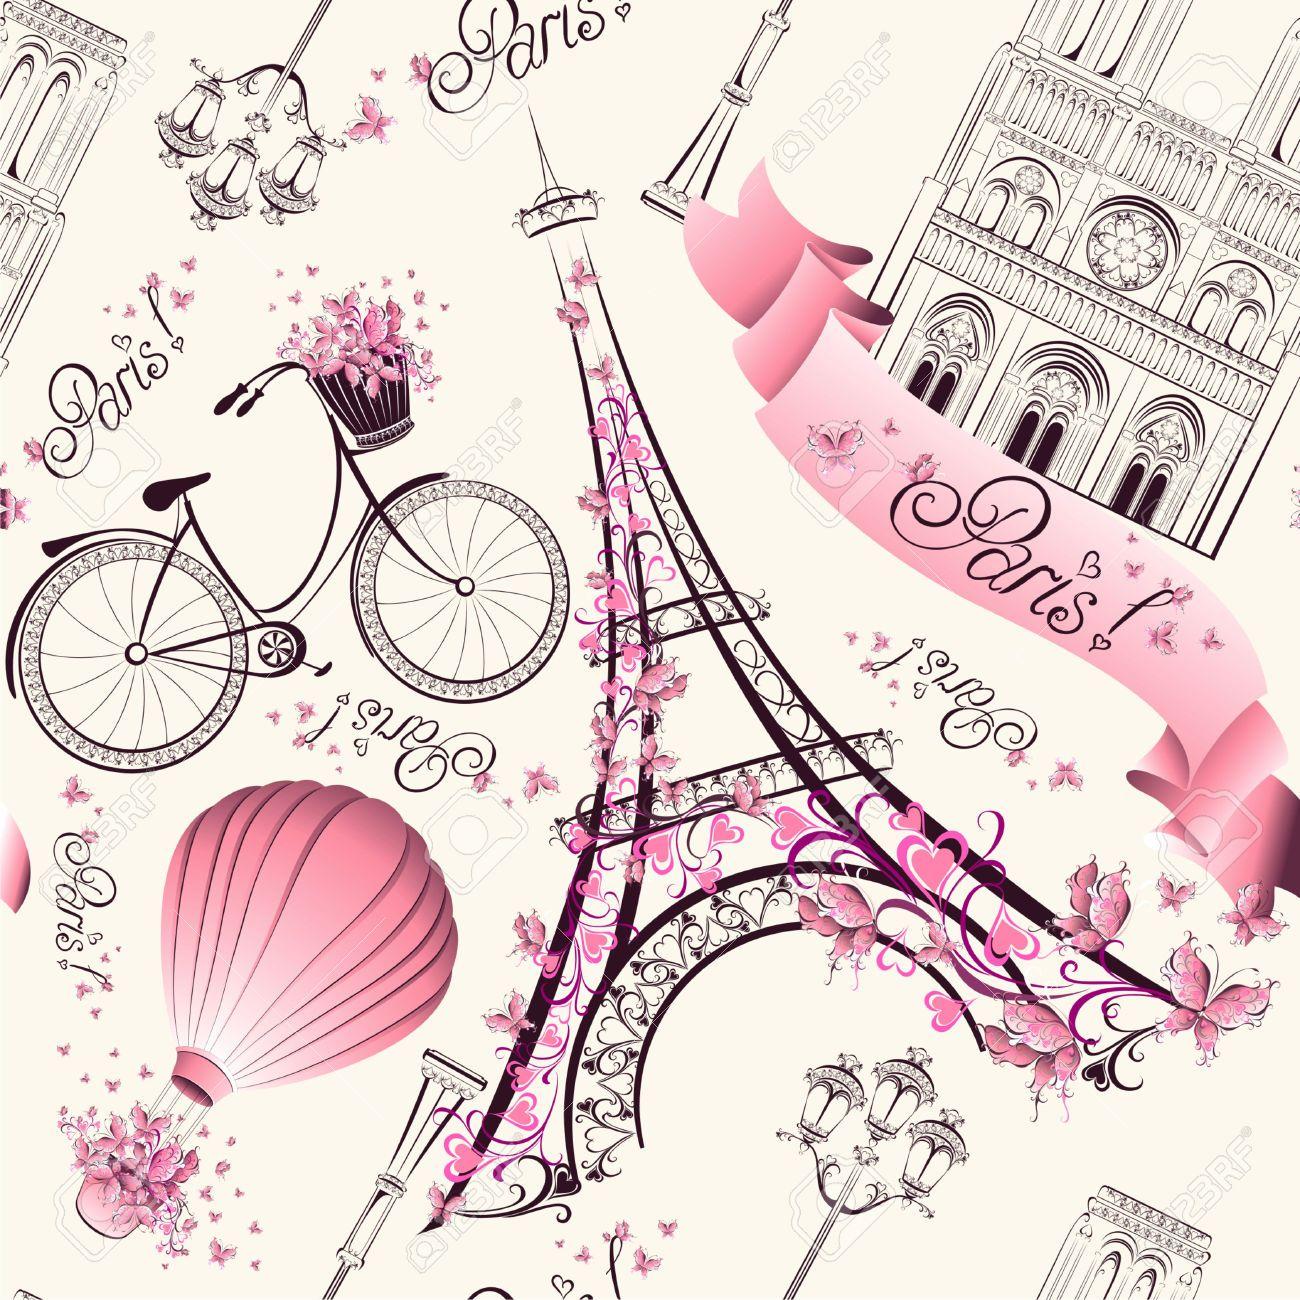 Paris Illustration: Paris Cliparts, Stock Vector And Royalty Free Paris